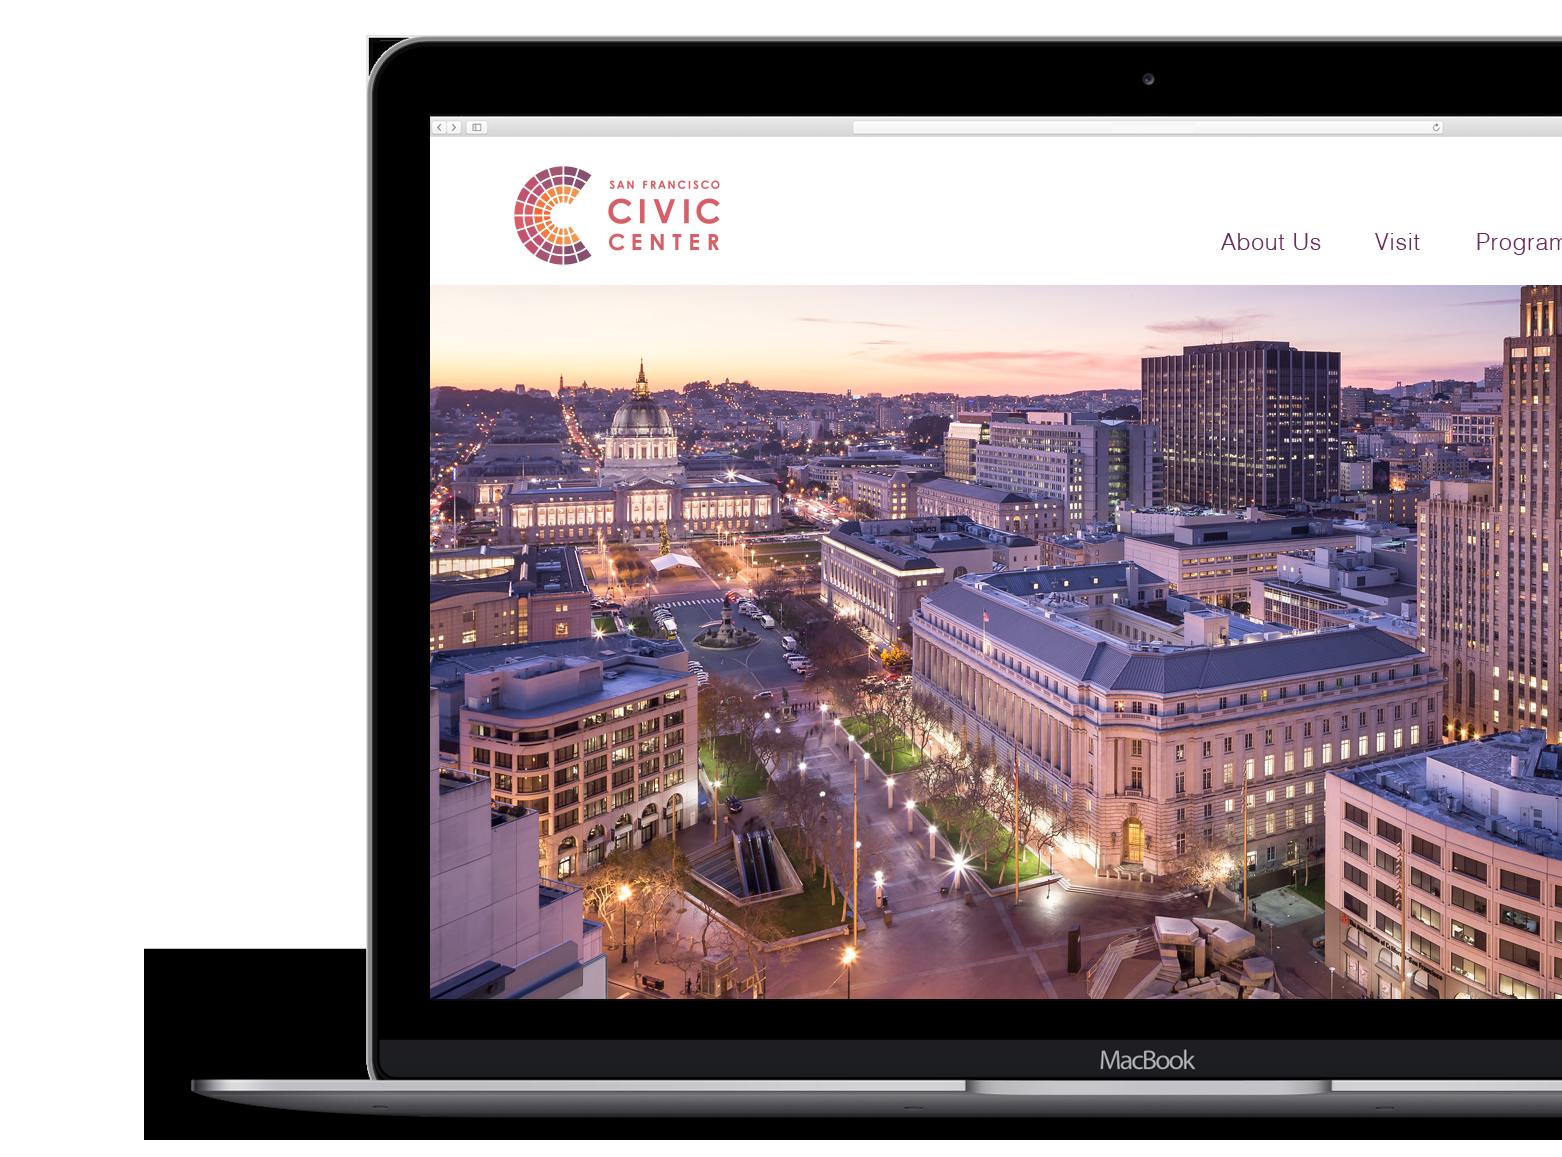 San Francisco Civic Center website on computer